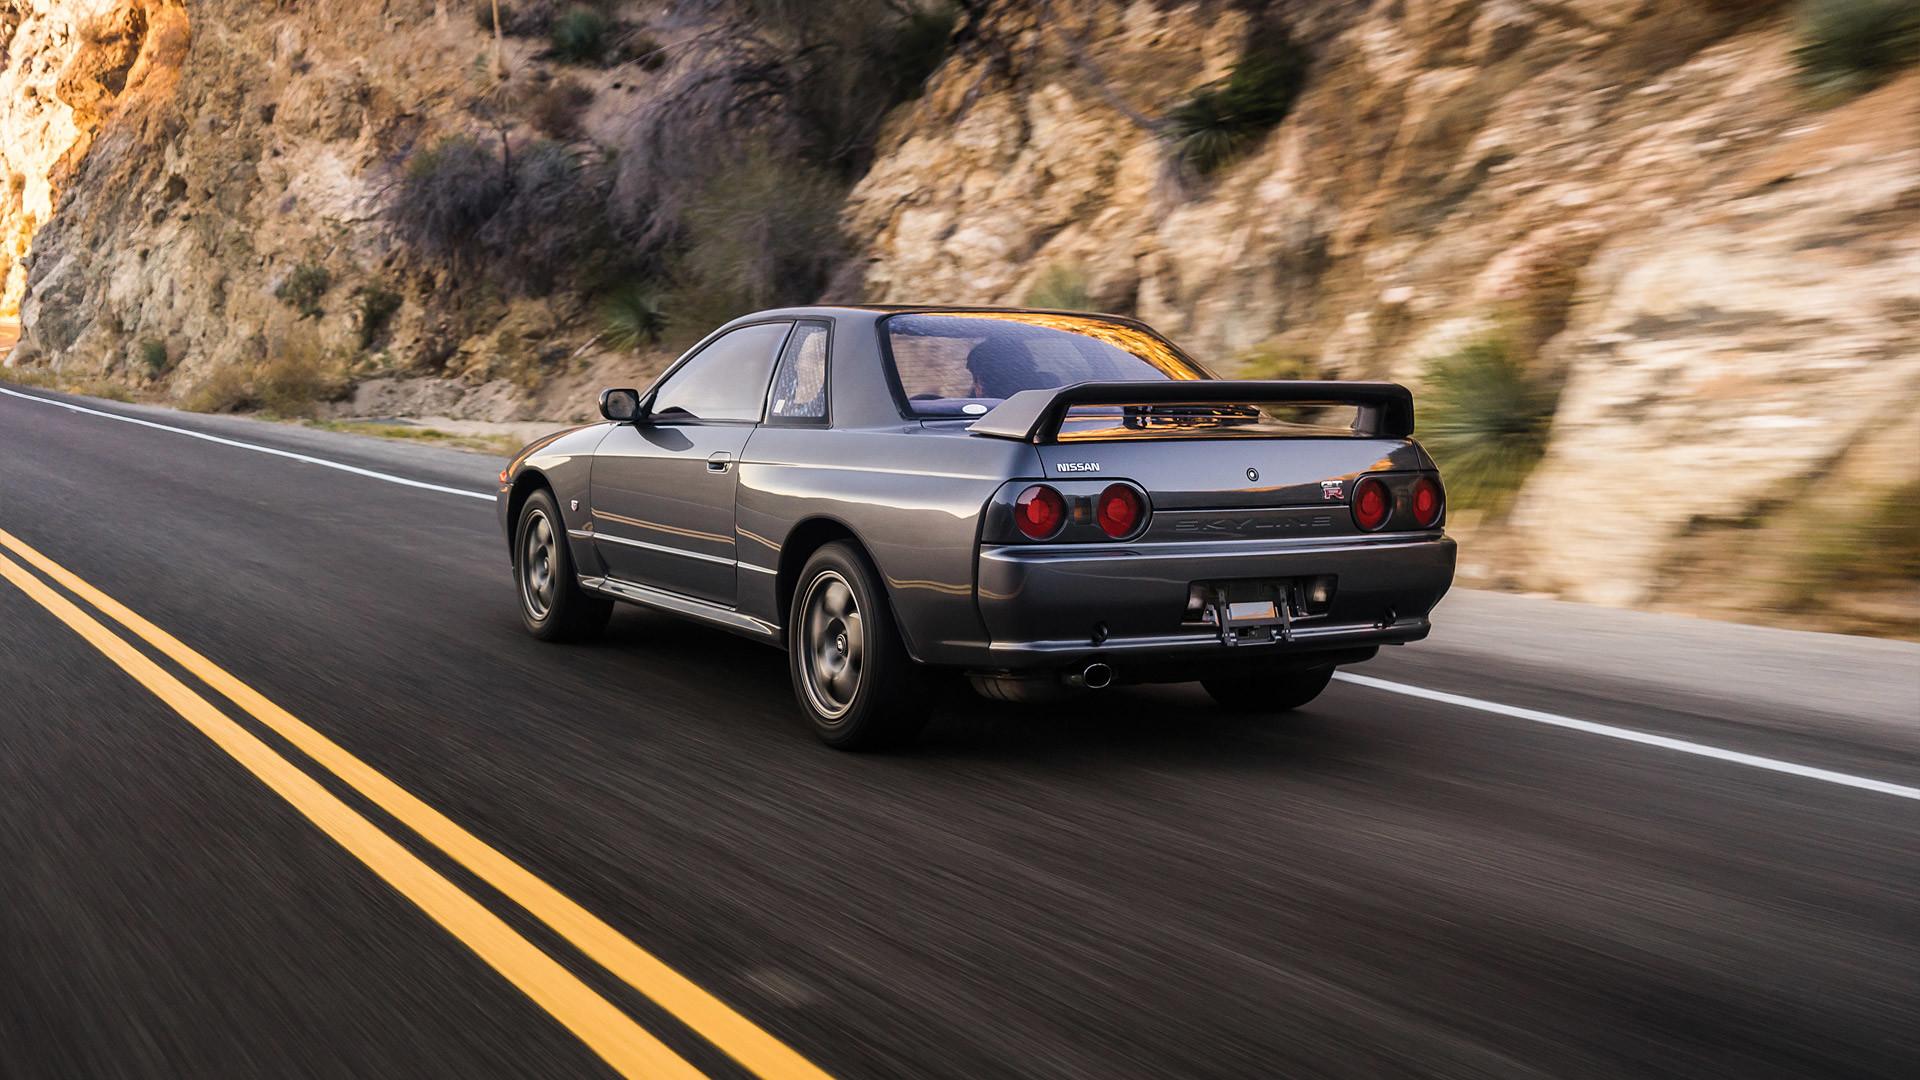 1989 Nissan Skyline GT-R picture